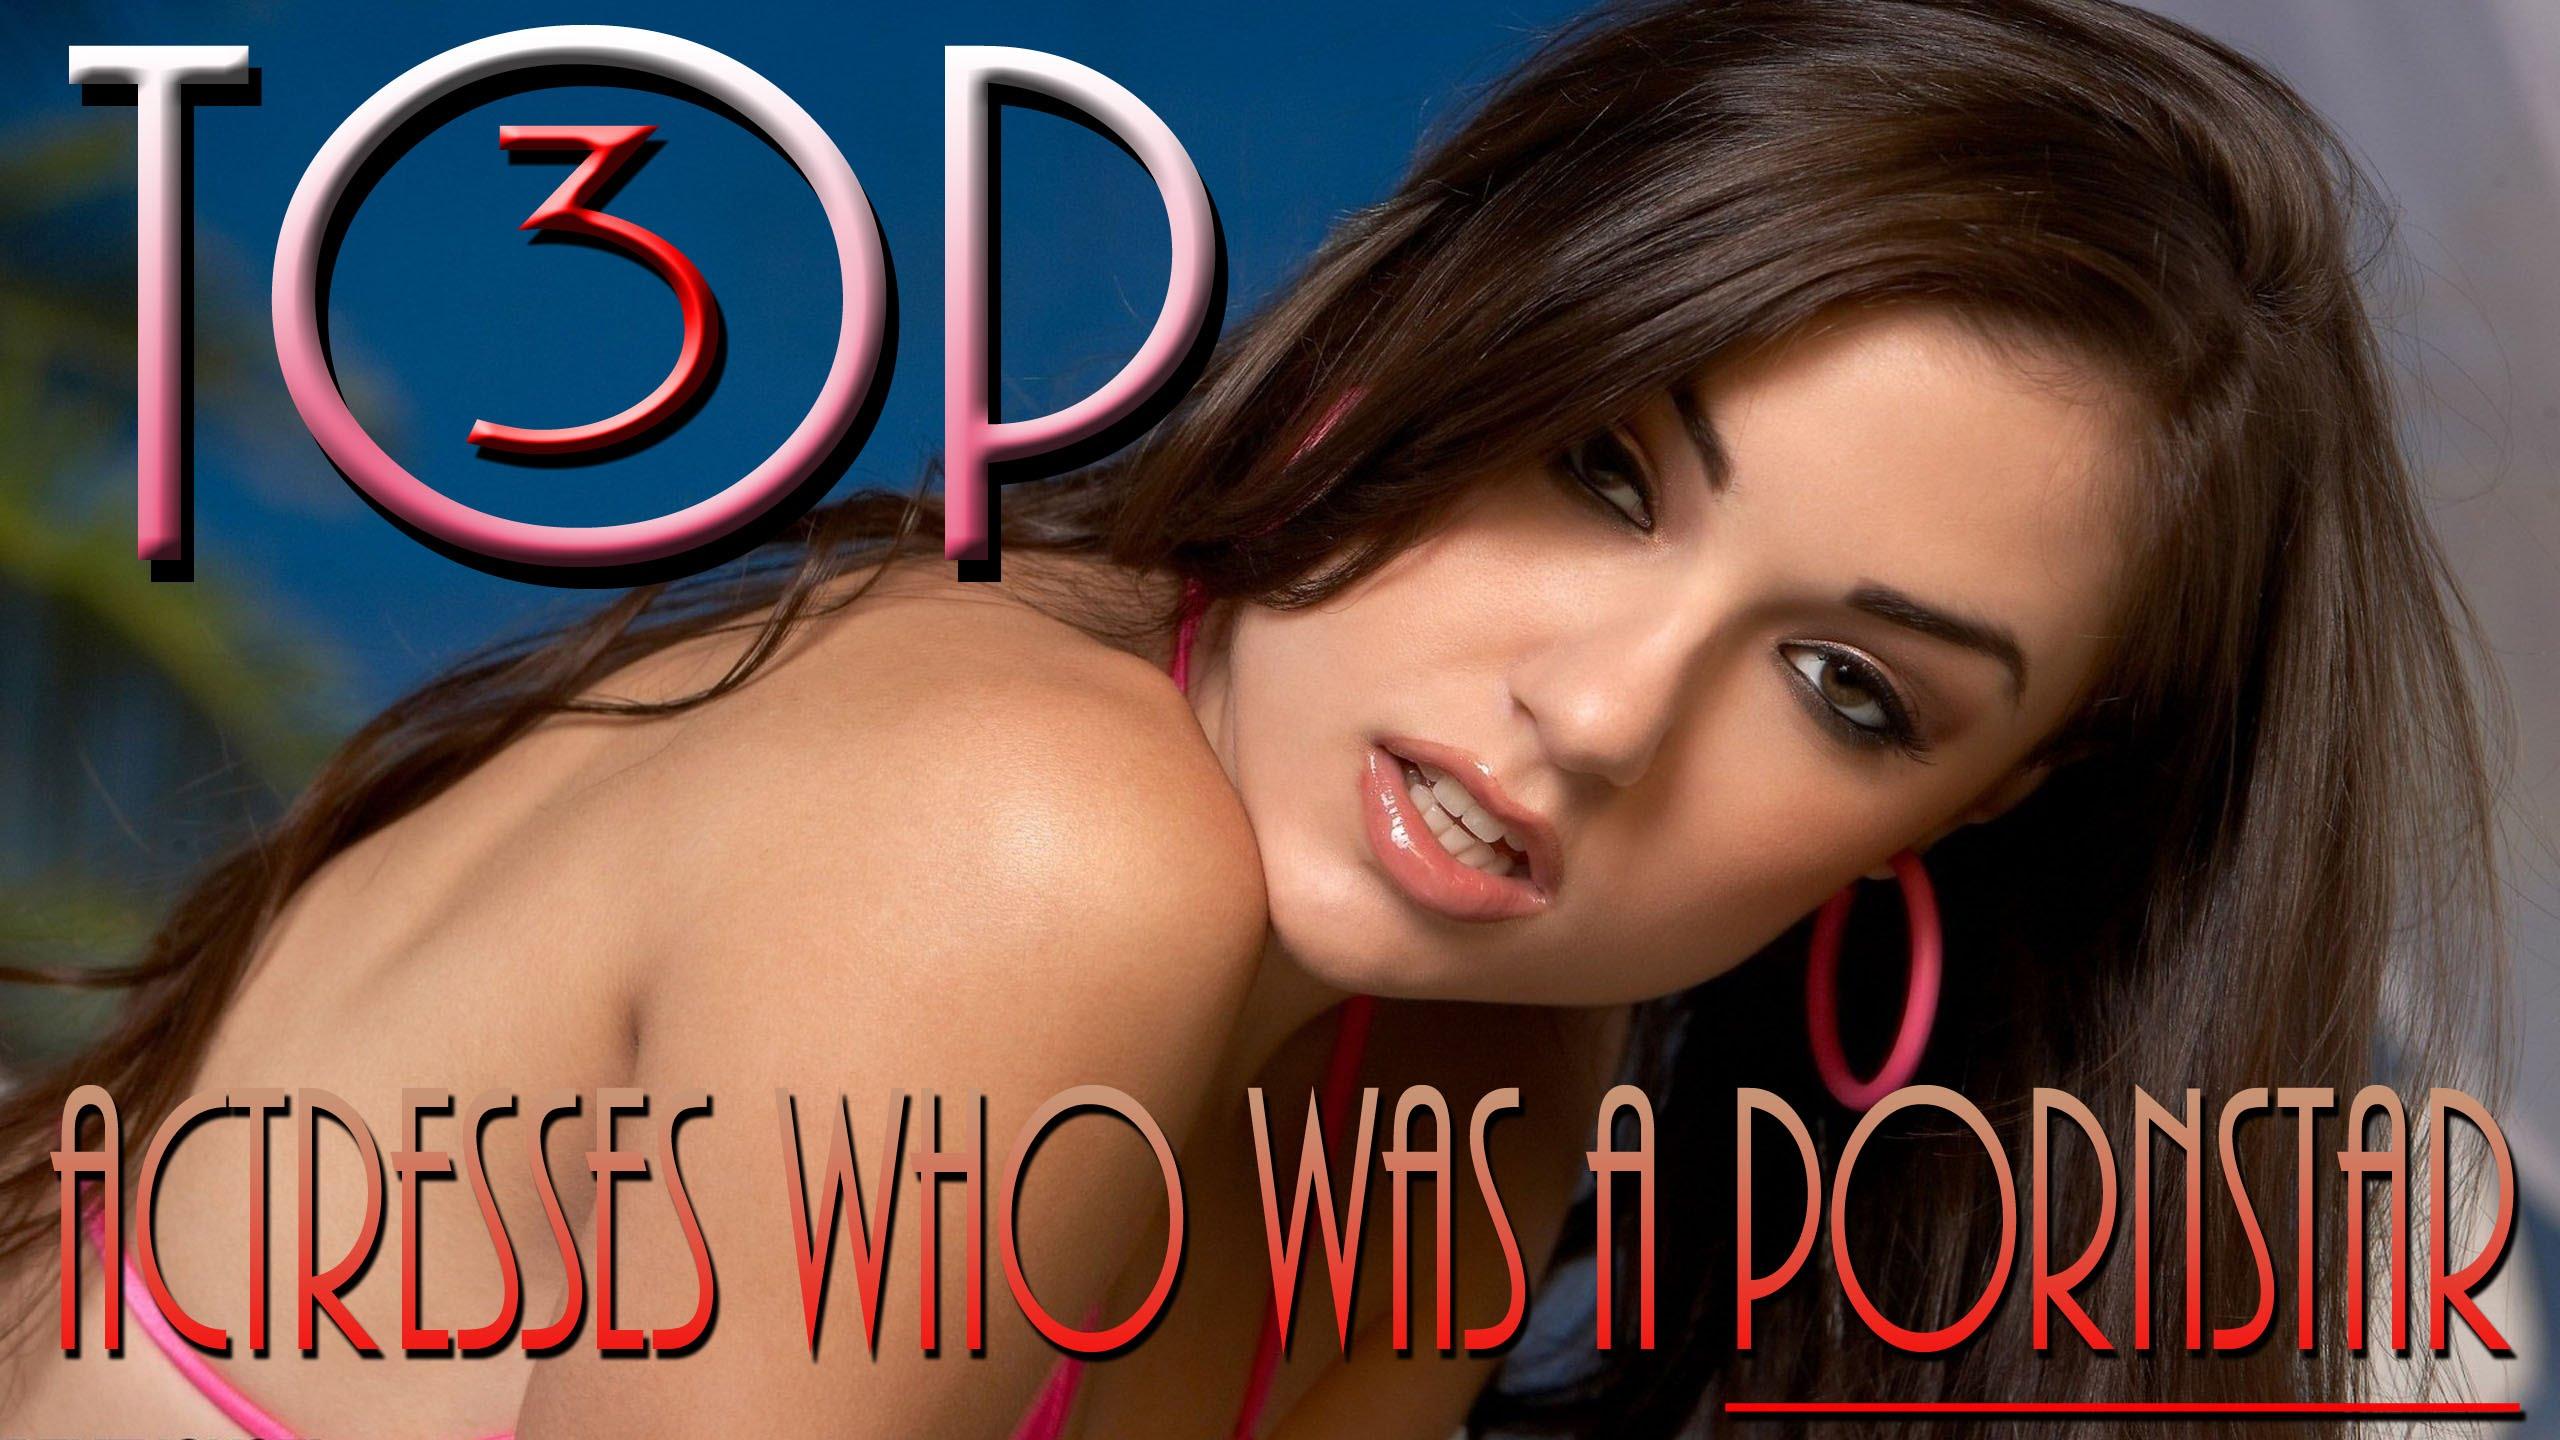 American Pie Actress Porn Video american pie 6 nude scenes - megapornx